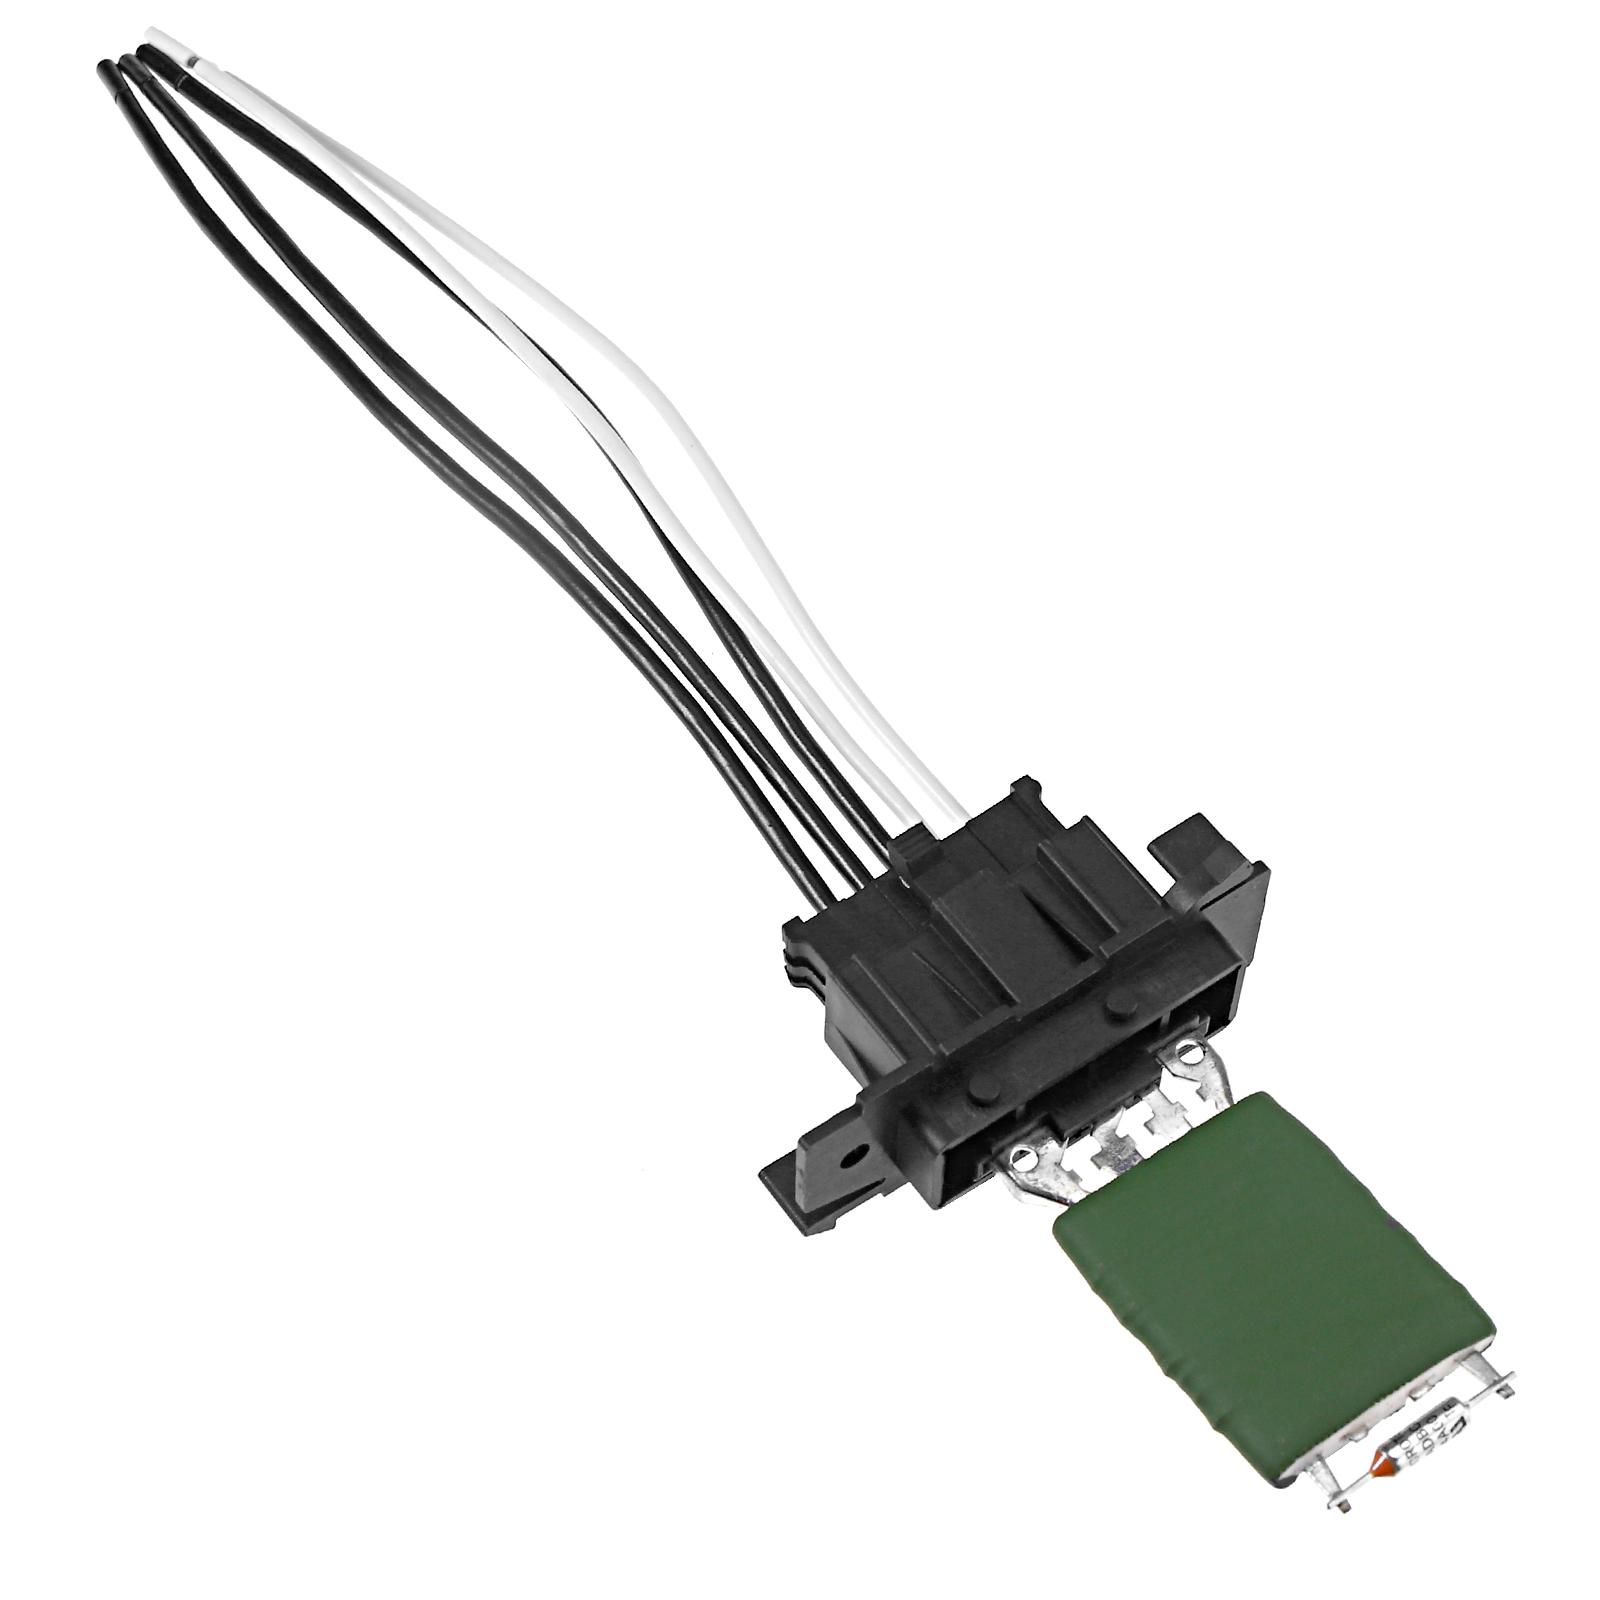 Blower Motor Heater Resistor Wiring Loom Harness Blk For